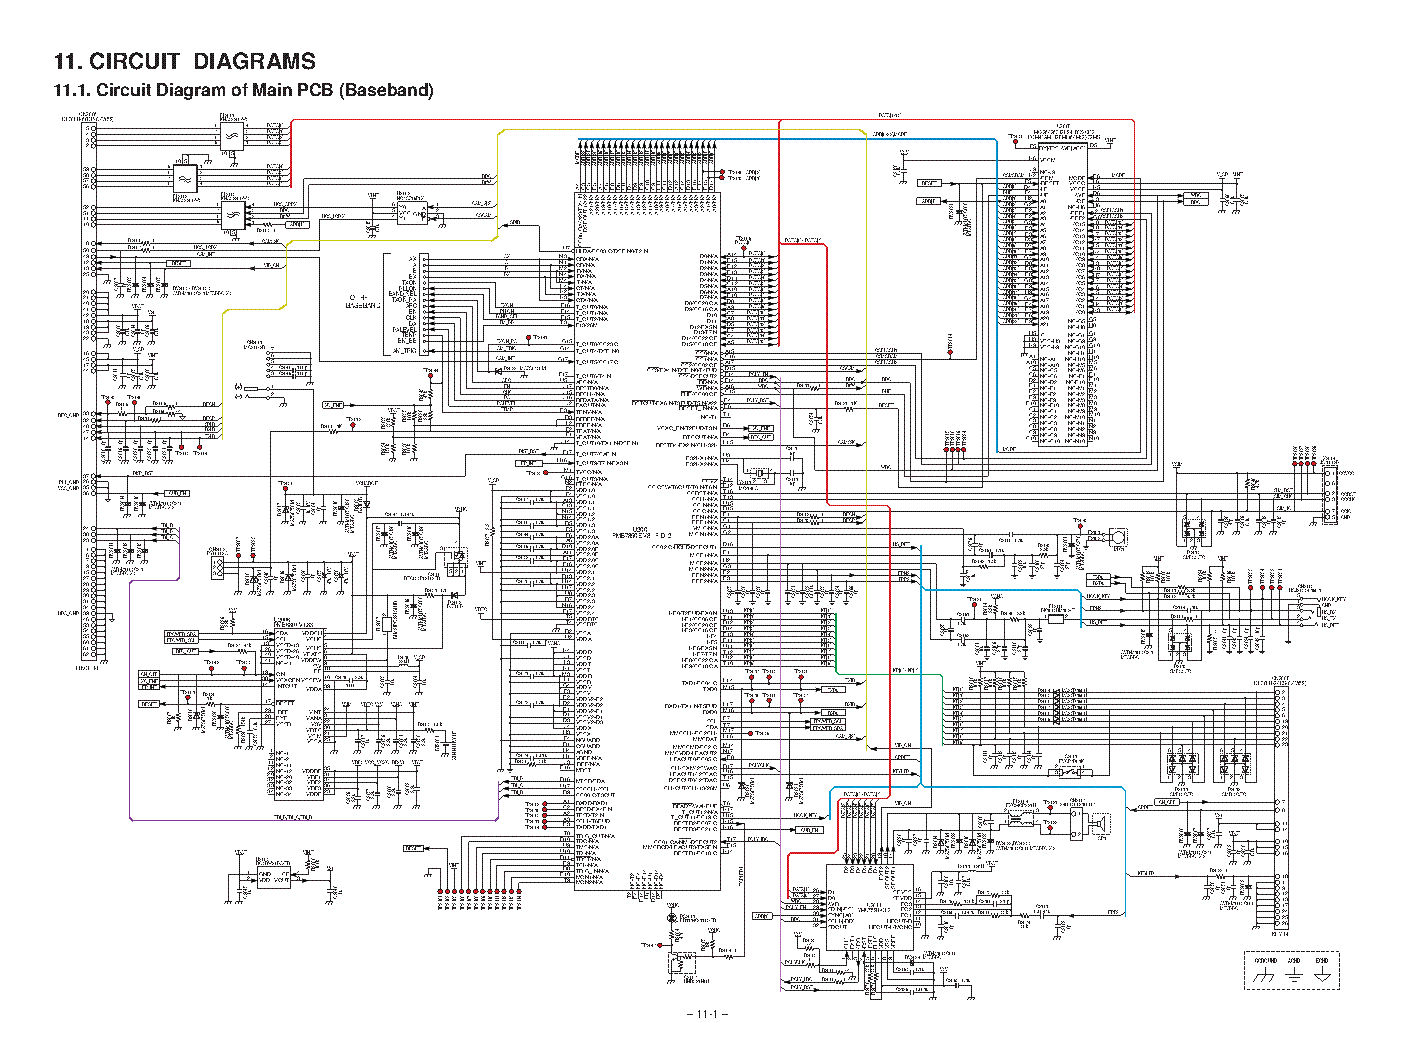 Panasonic sa vk50 схема